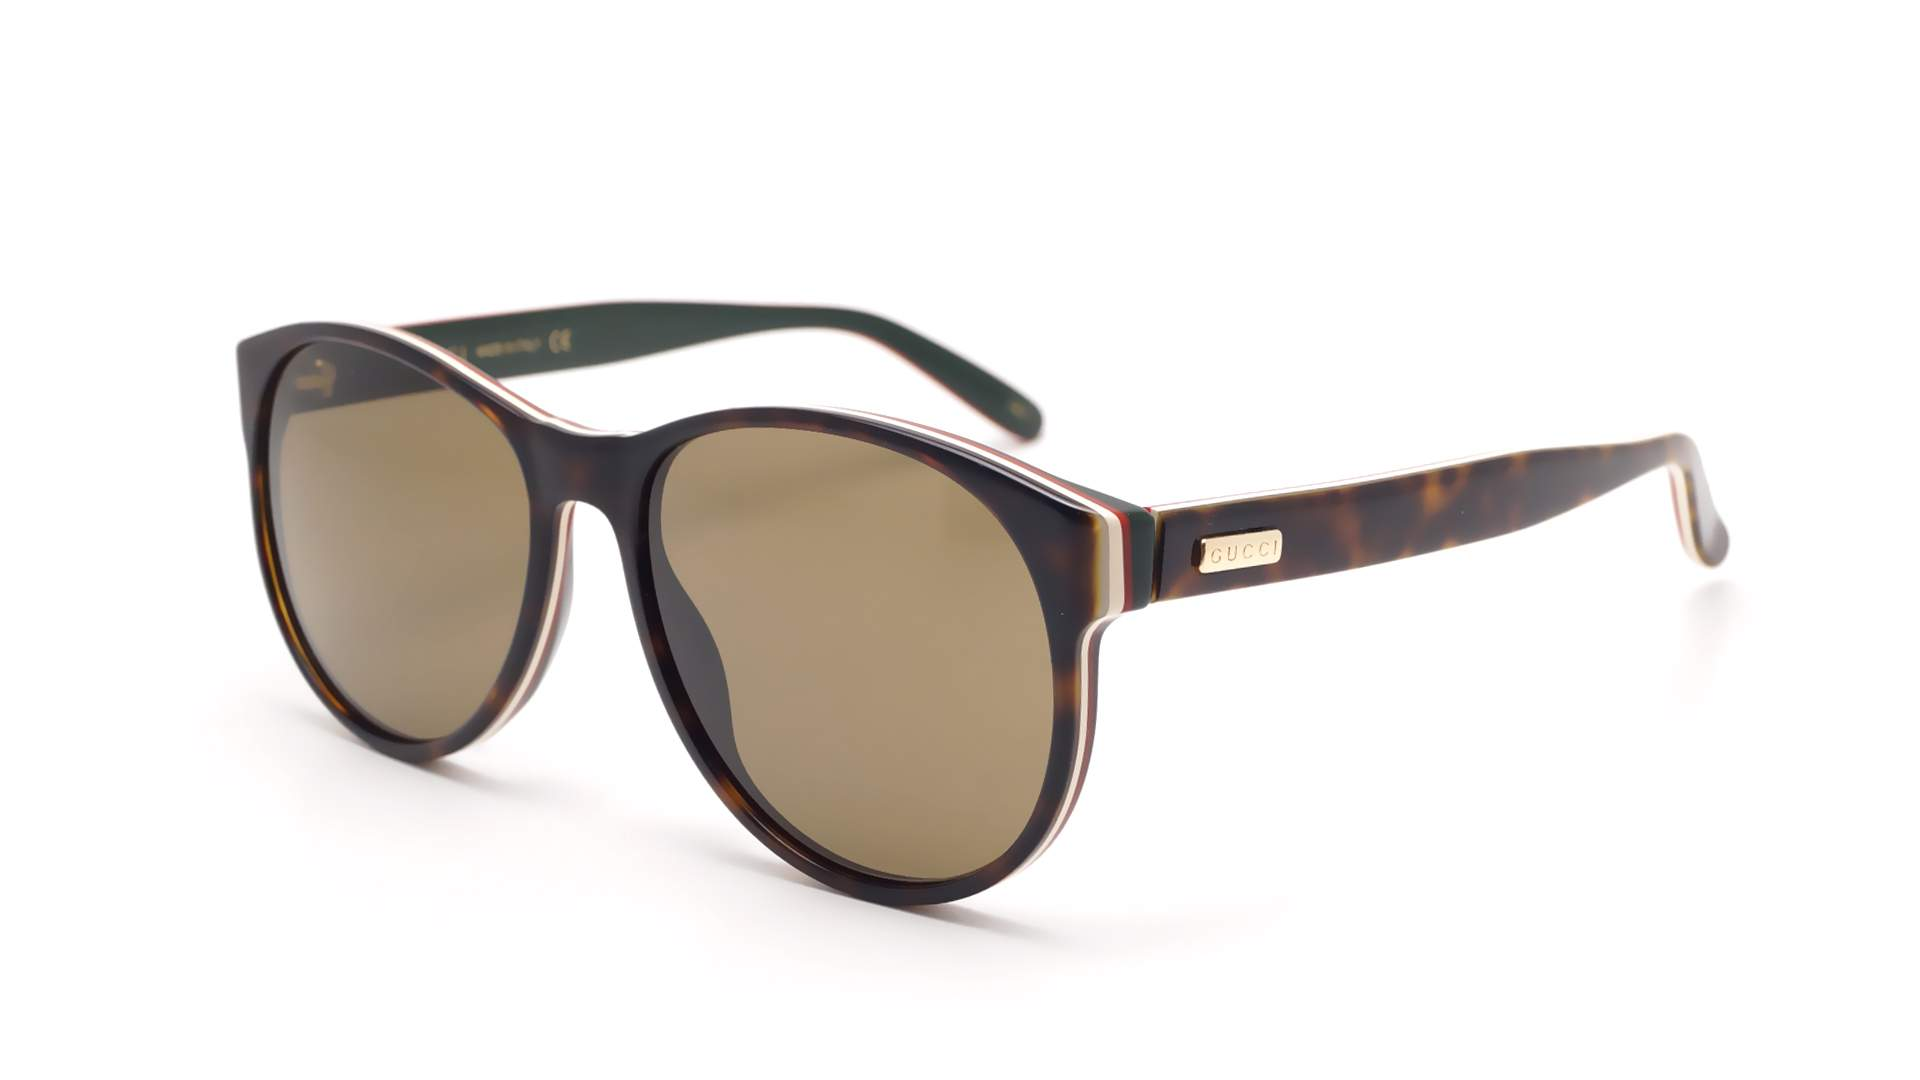 5270951c33c Sunglasses Gucci GG0271S 002 55-16 Tortoise Medium